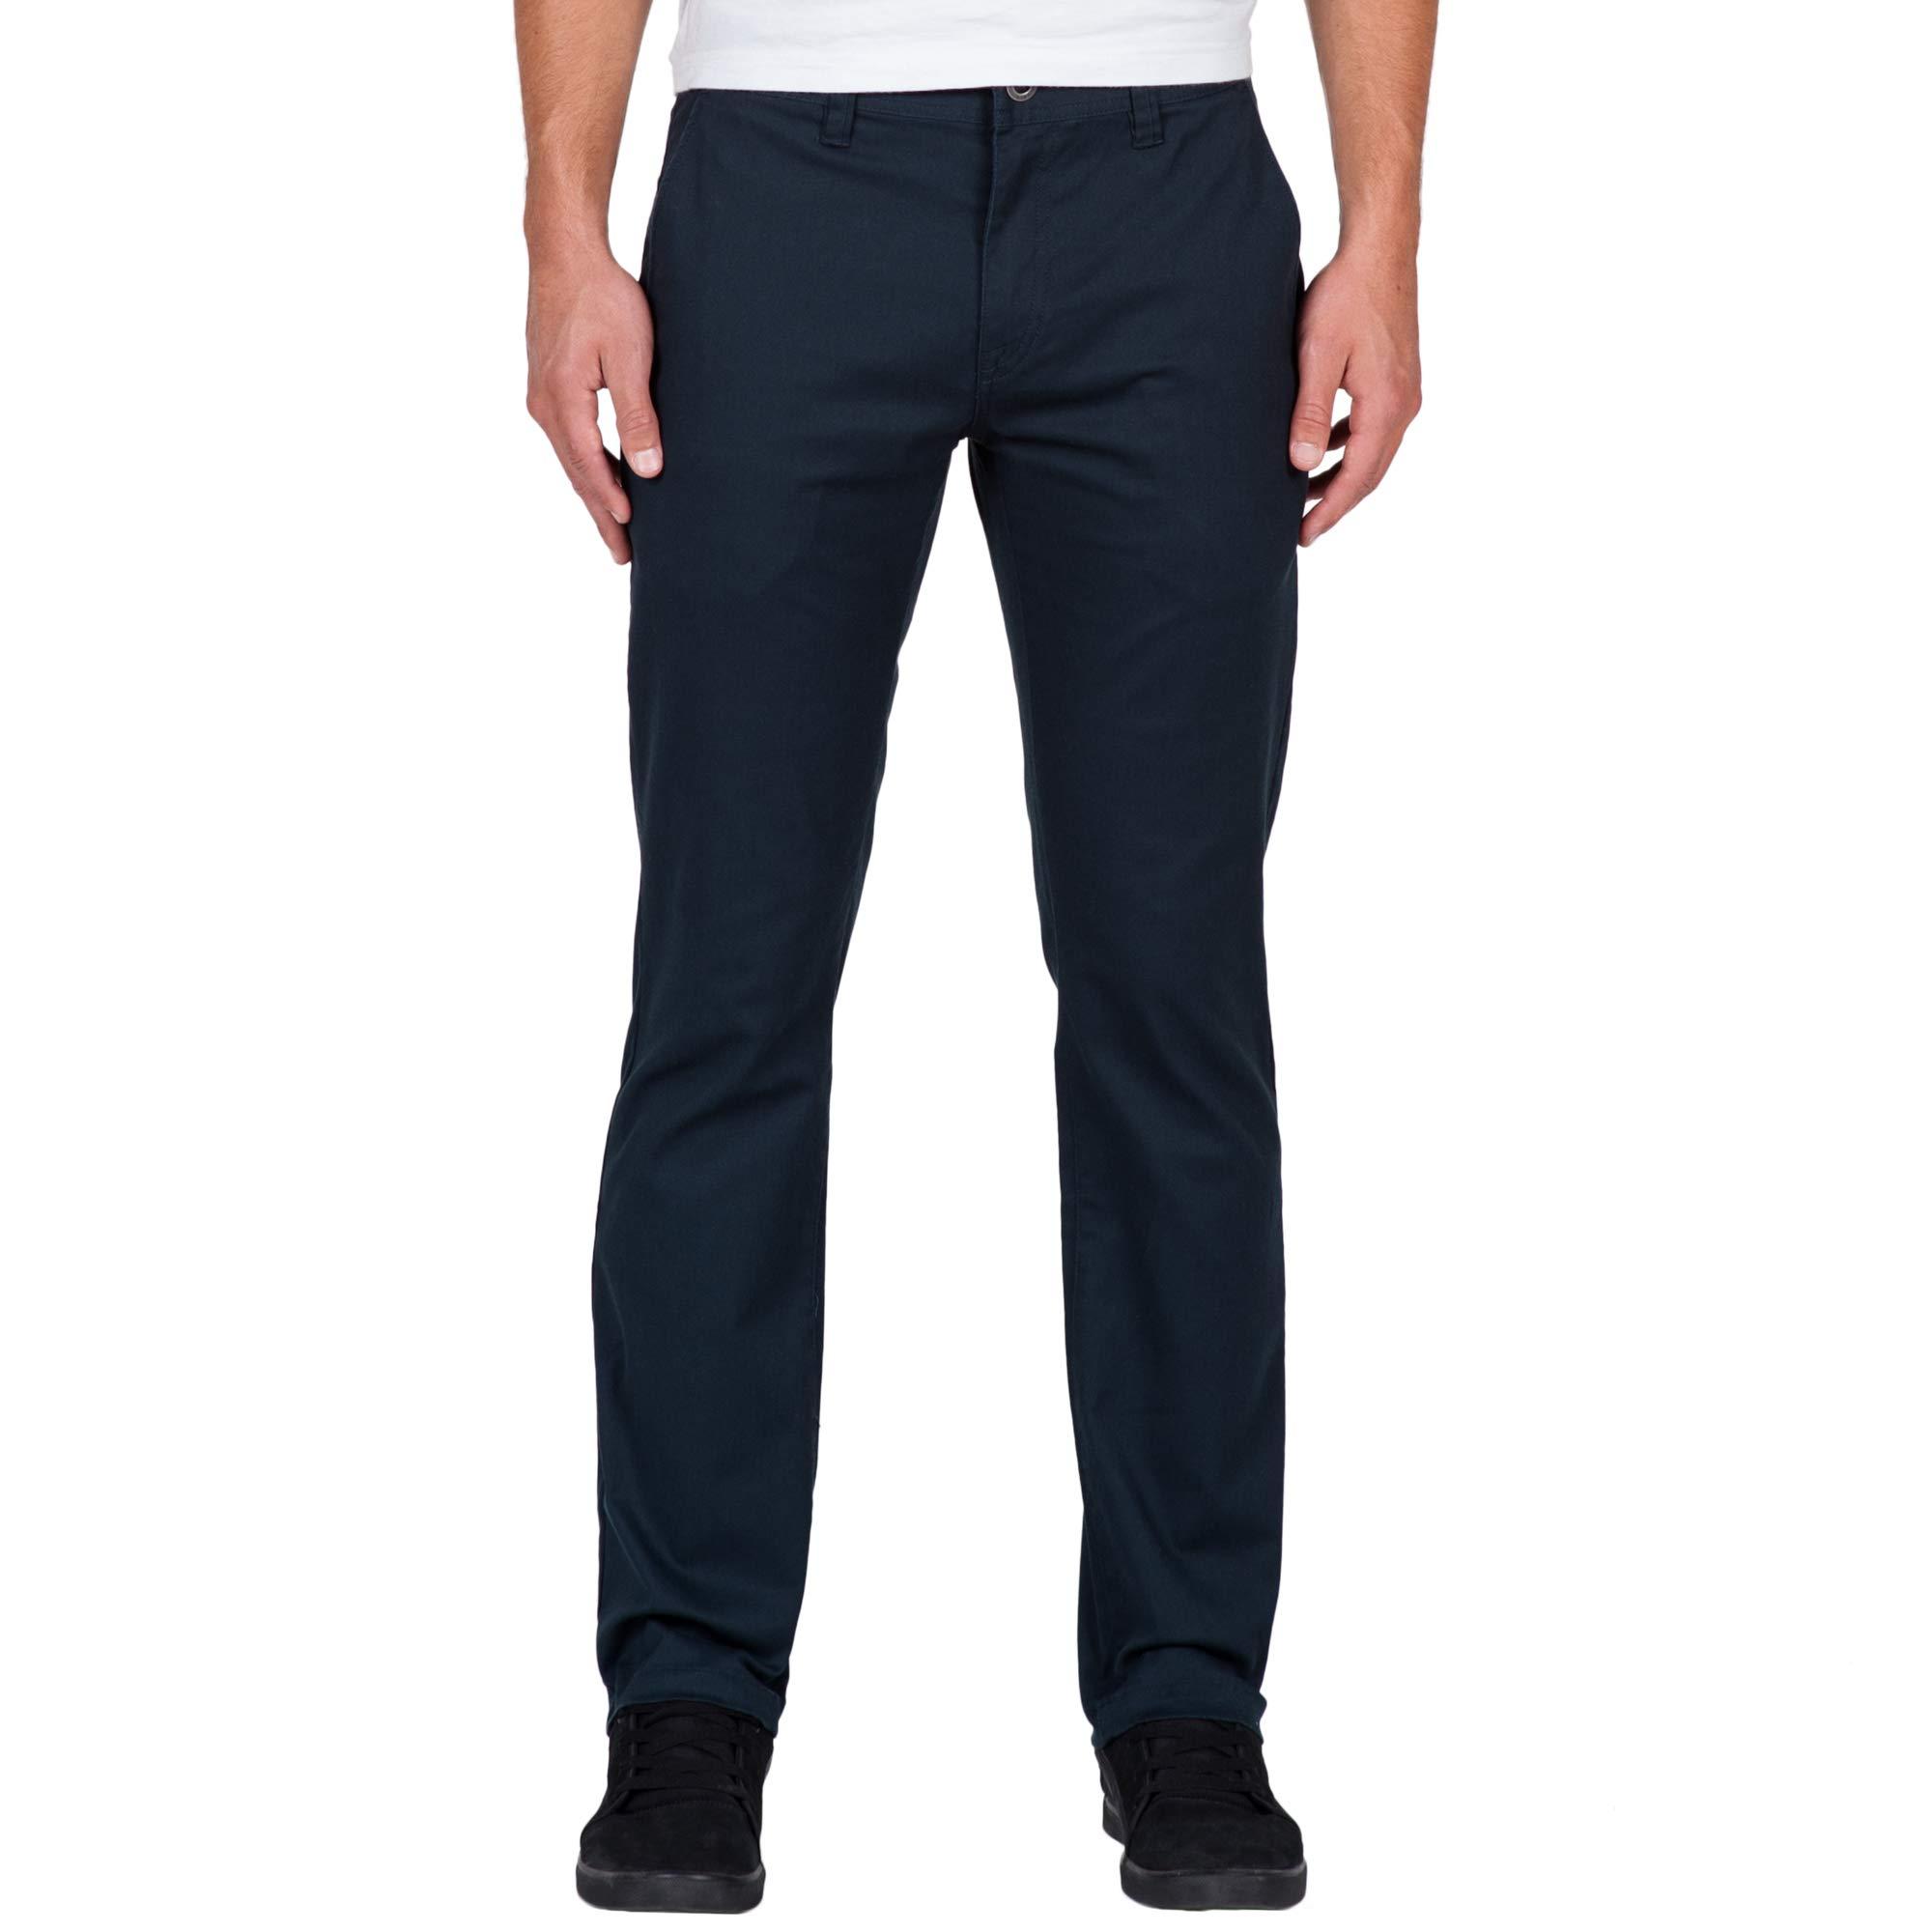 Volcom Men's Frickin Modern Fit Stretch Chino Pant, Dark Navy 2016, 36